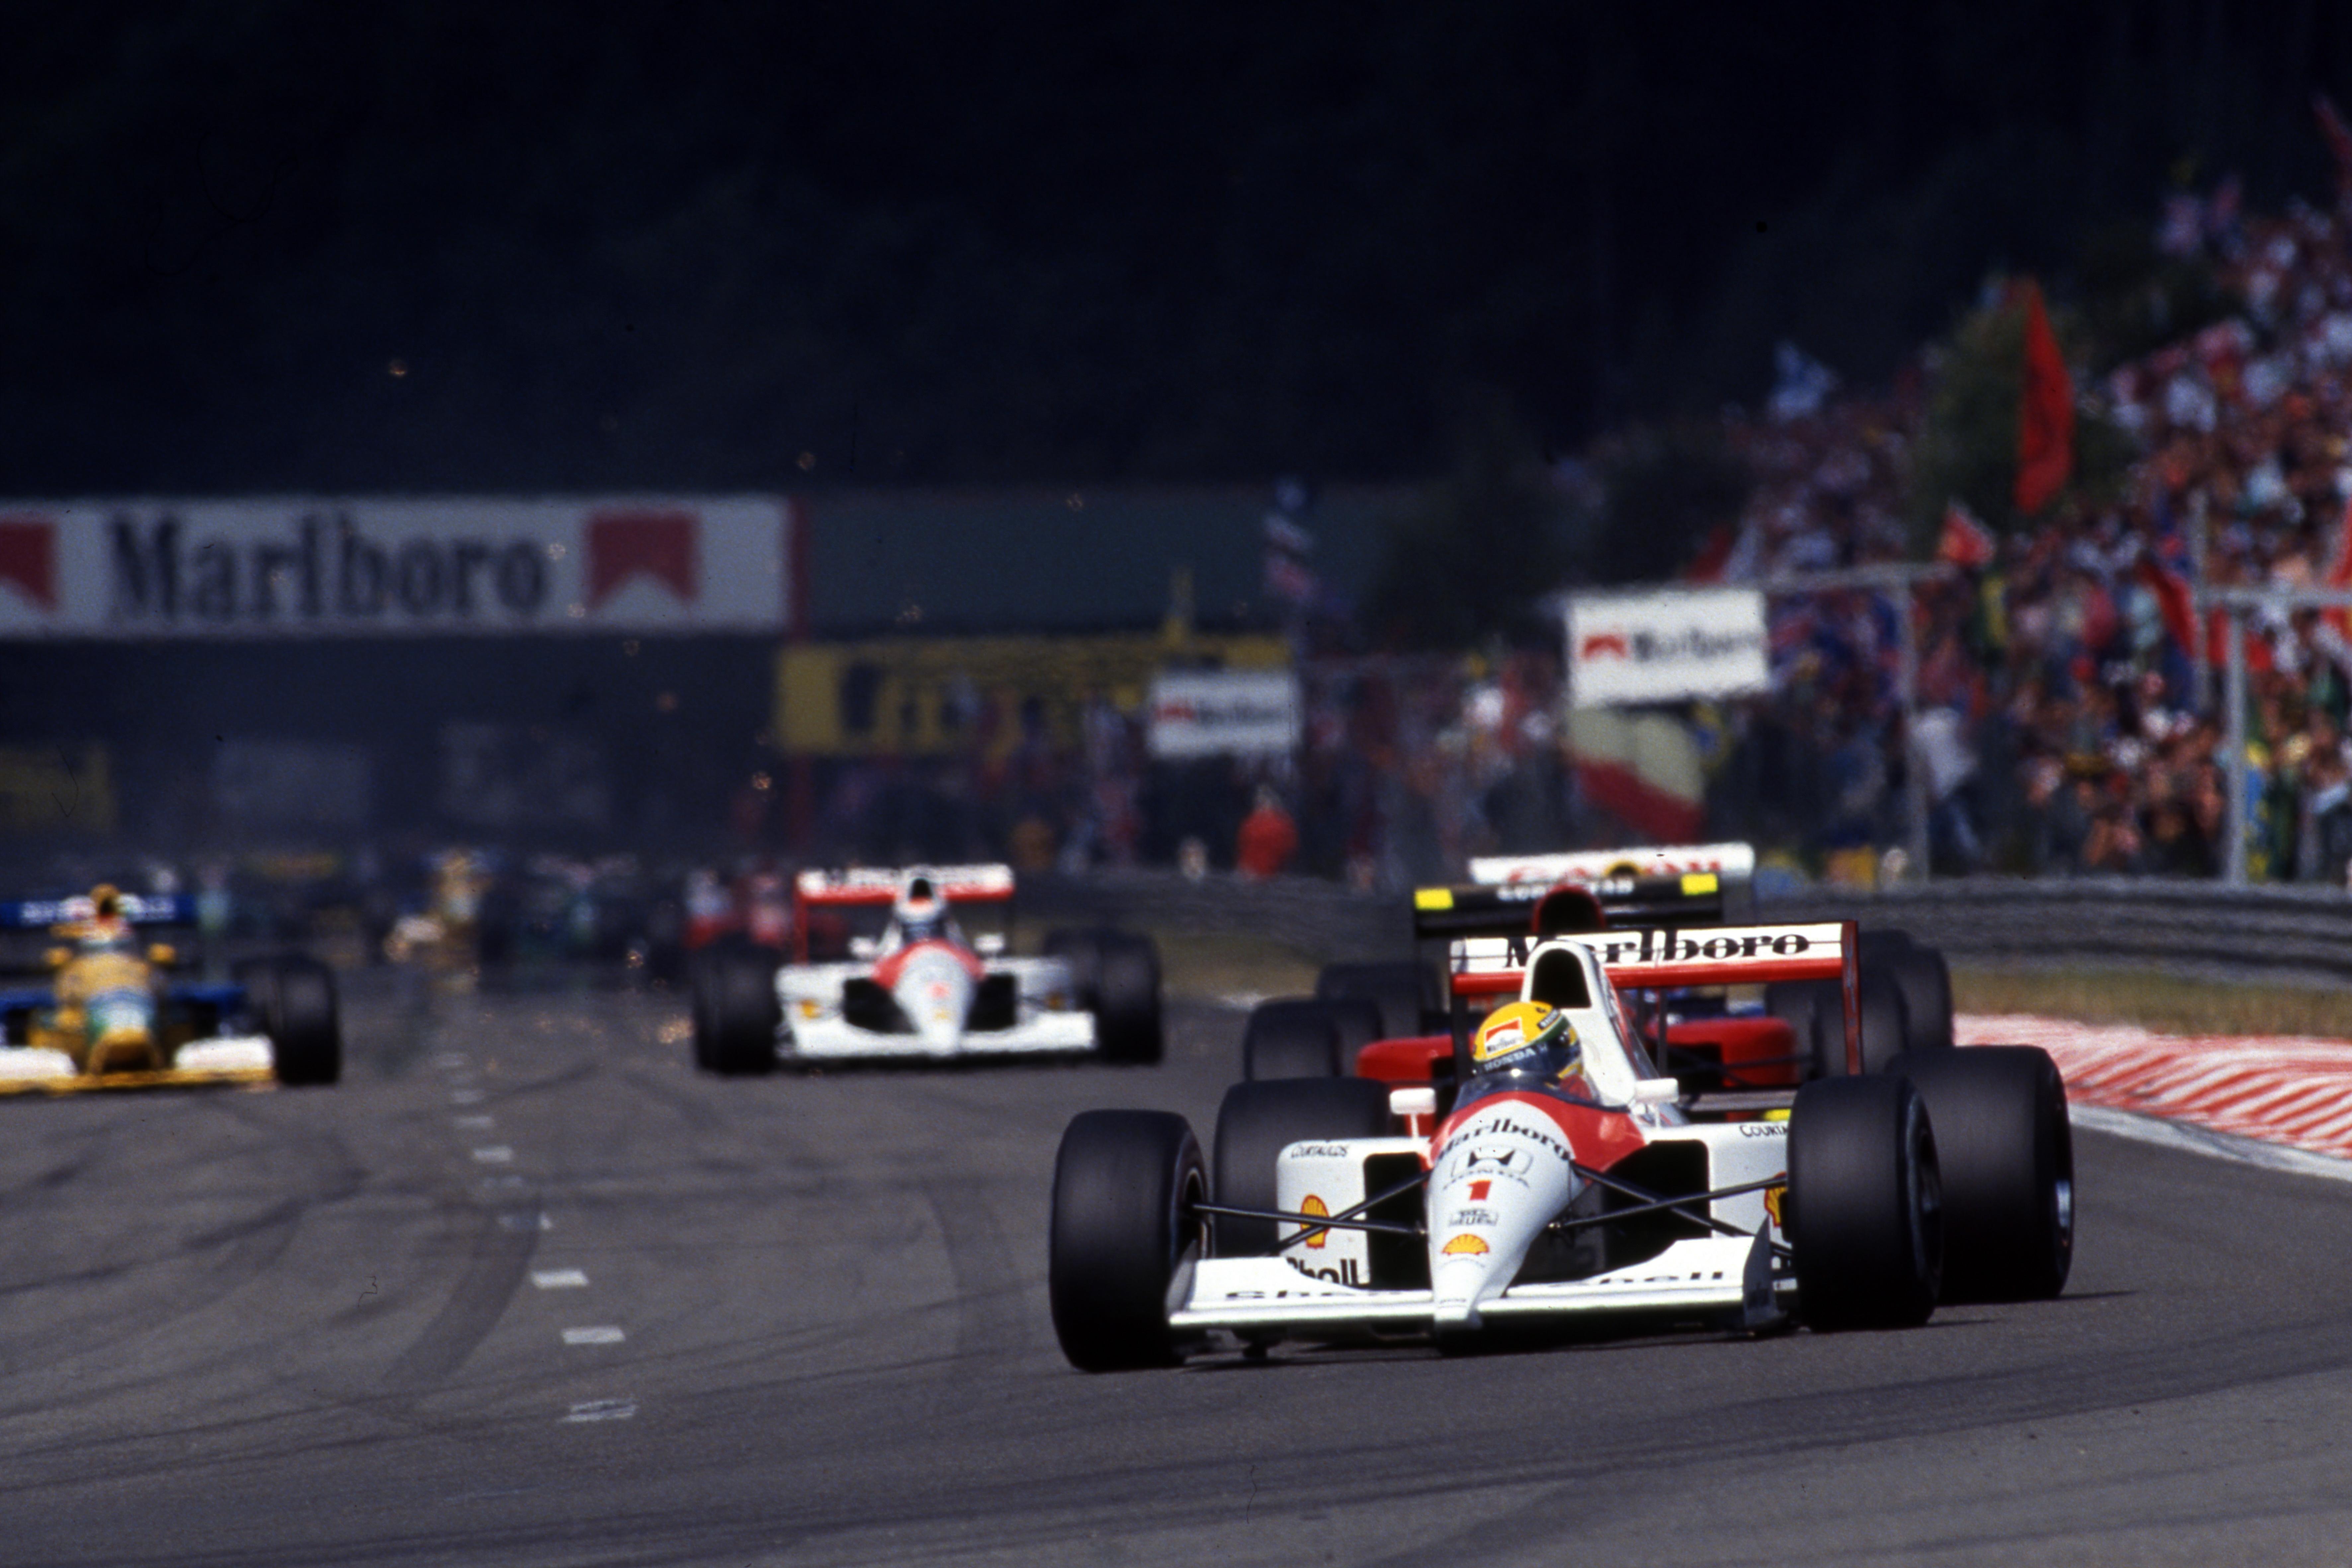 Ayrton Senna, McLaren, F1 1991, Belgian Grand Prix